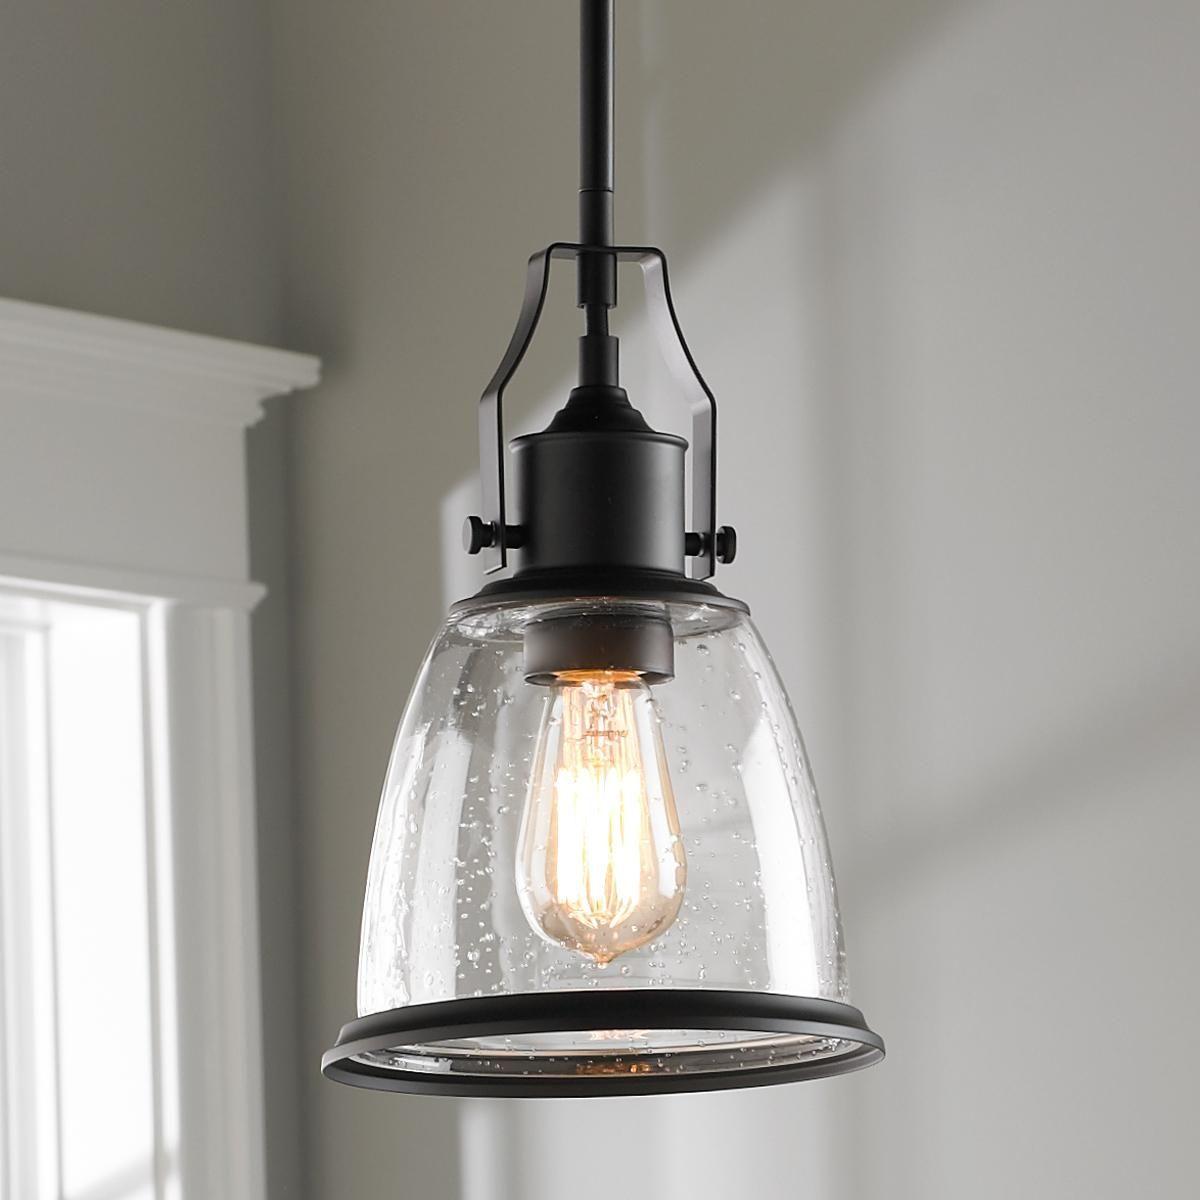 Classic Bell Shade Pendant Rustic Pendant Lighting Glass Pendant Light Industrial Pendant Lights